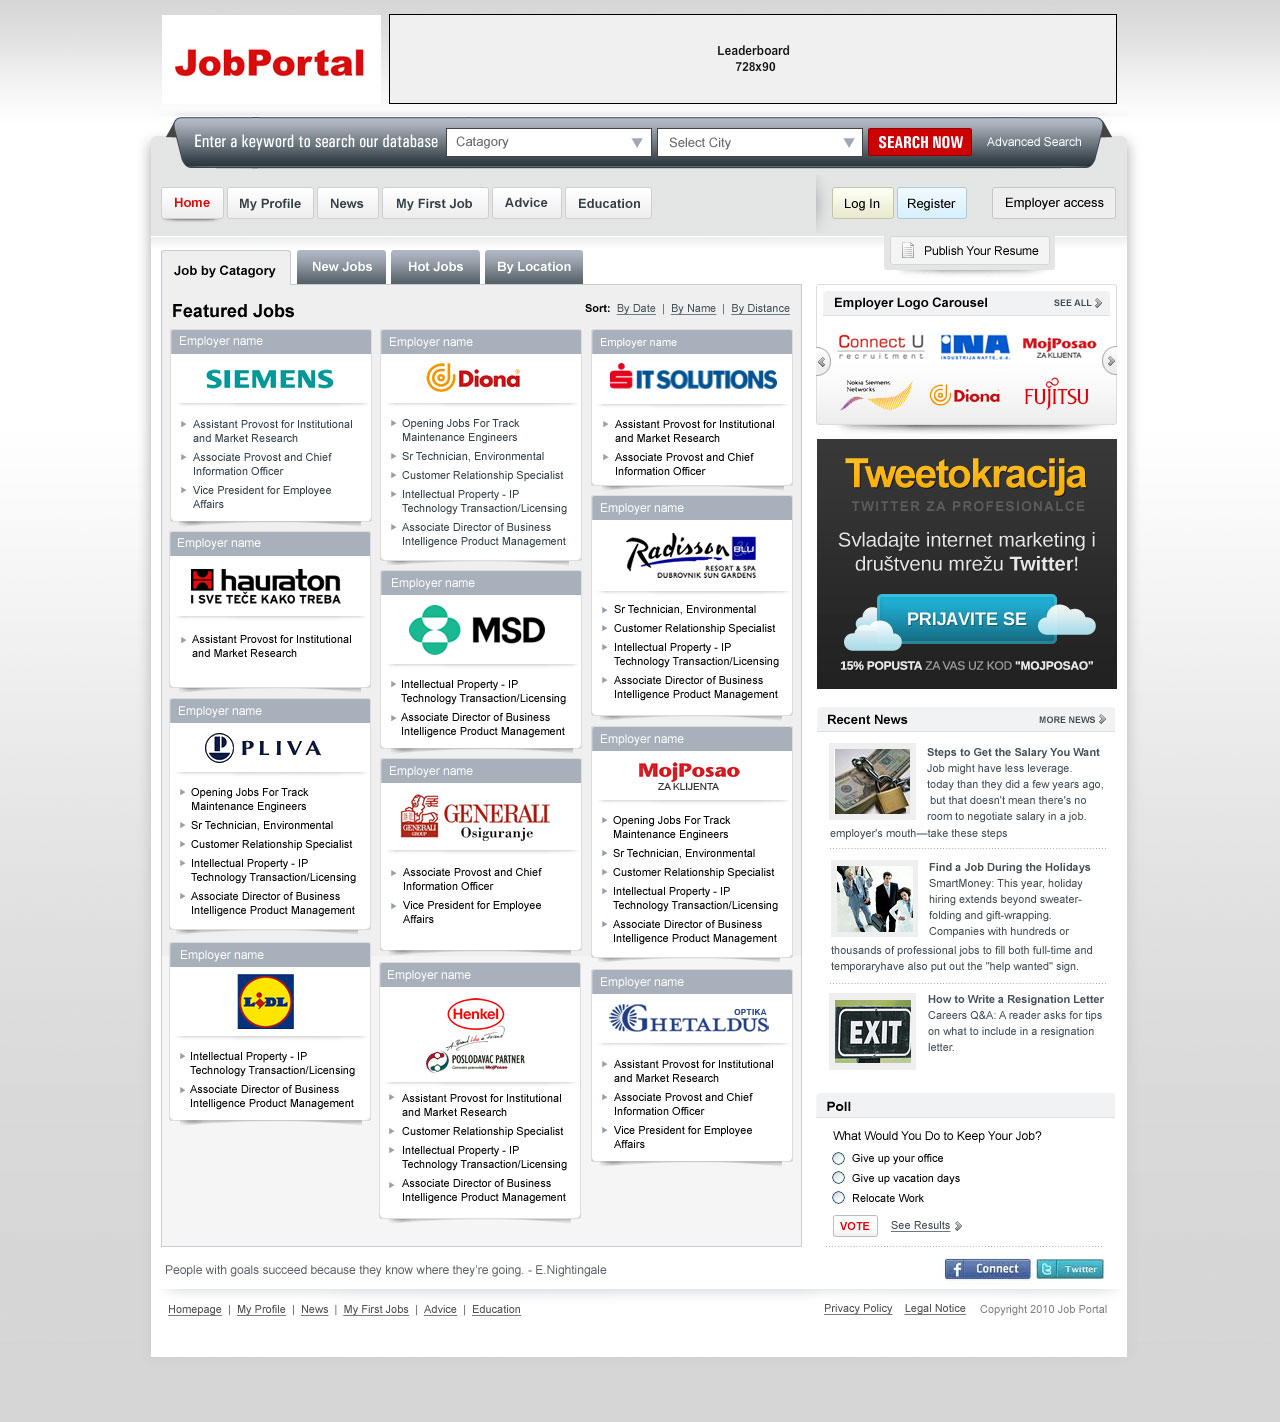 JobPortal HomePage UI Design